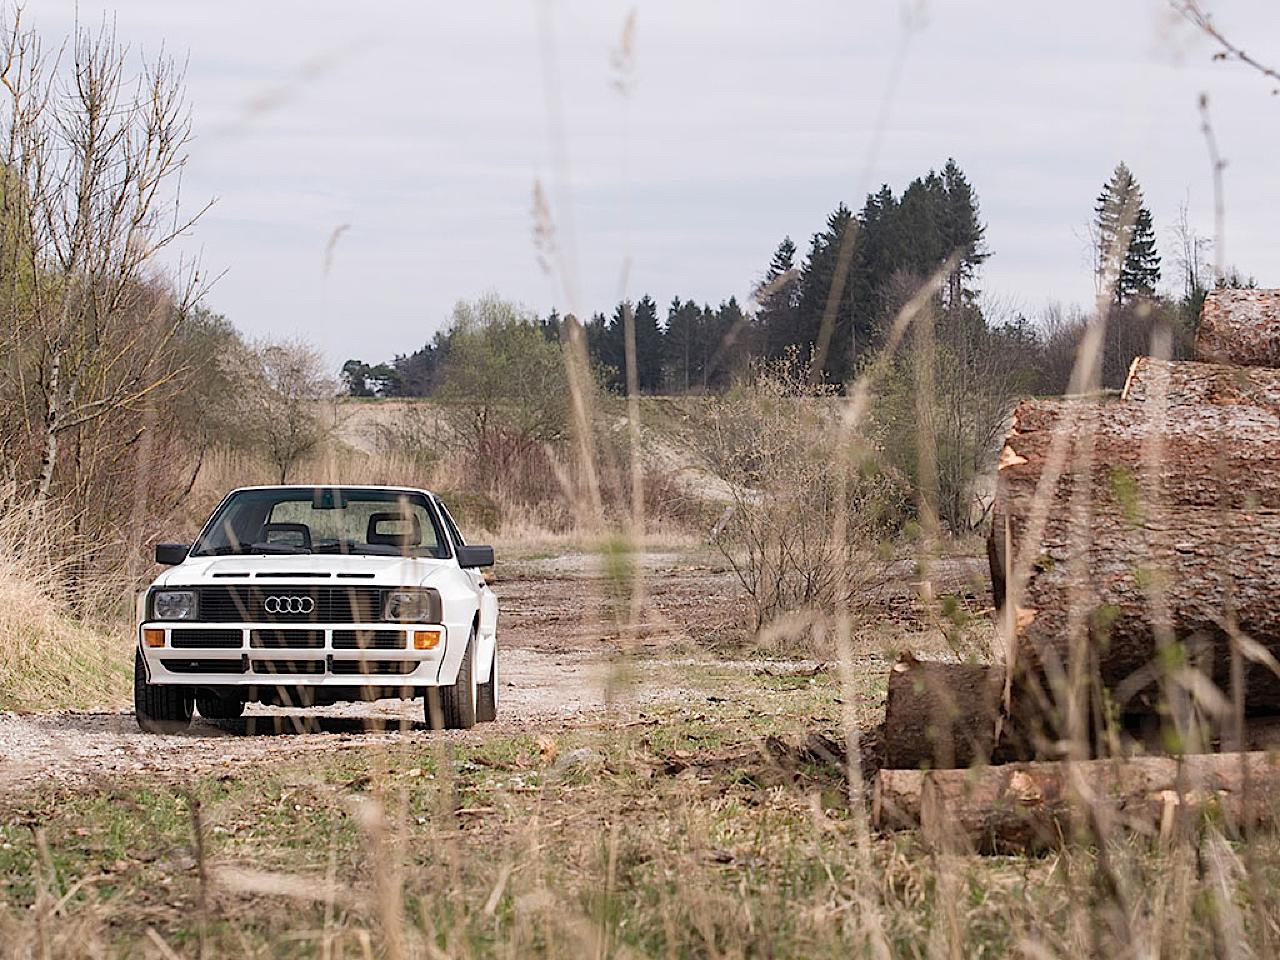 Audi Quattro Sport - Châssis court, turbo et muscu ! 6